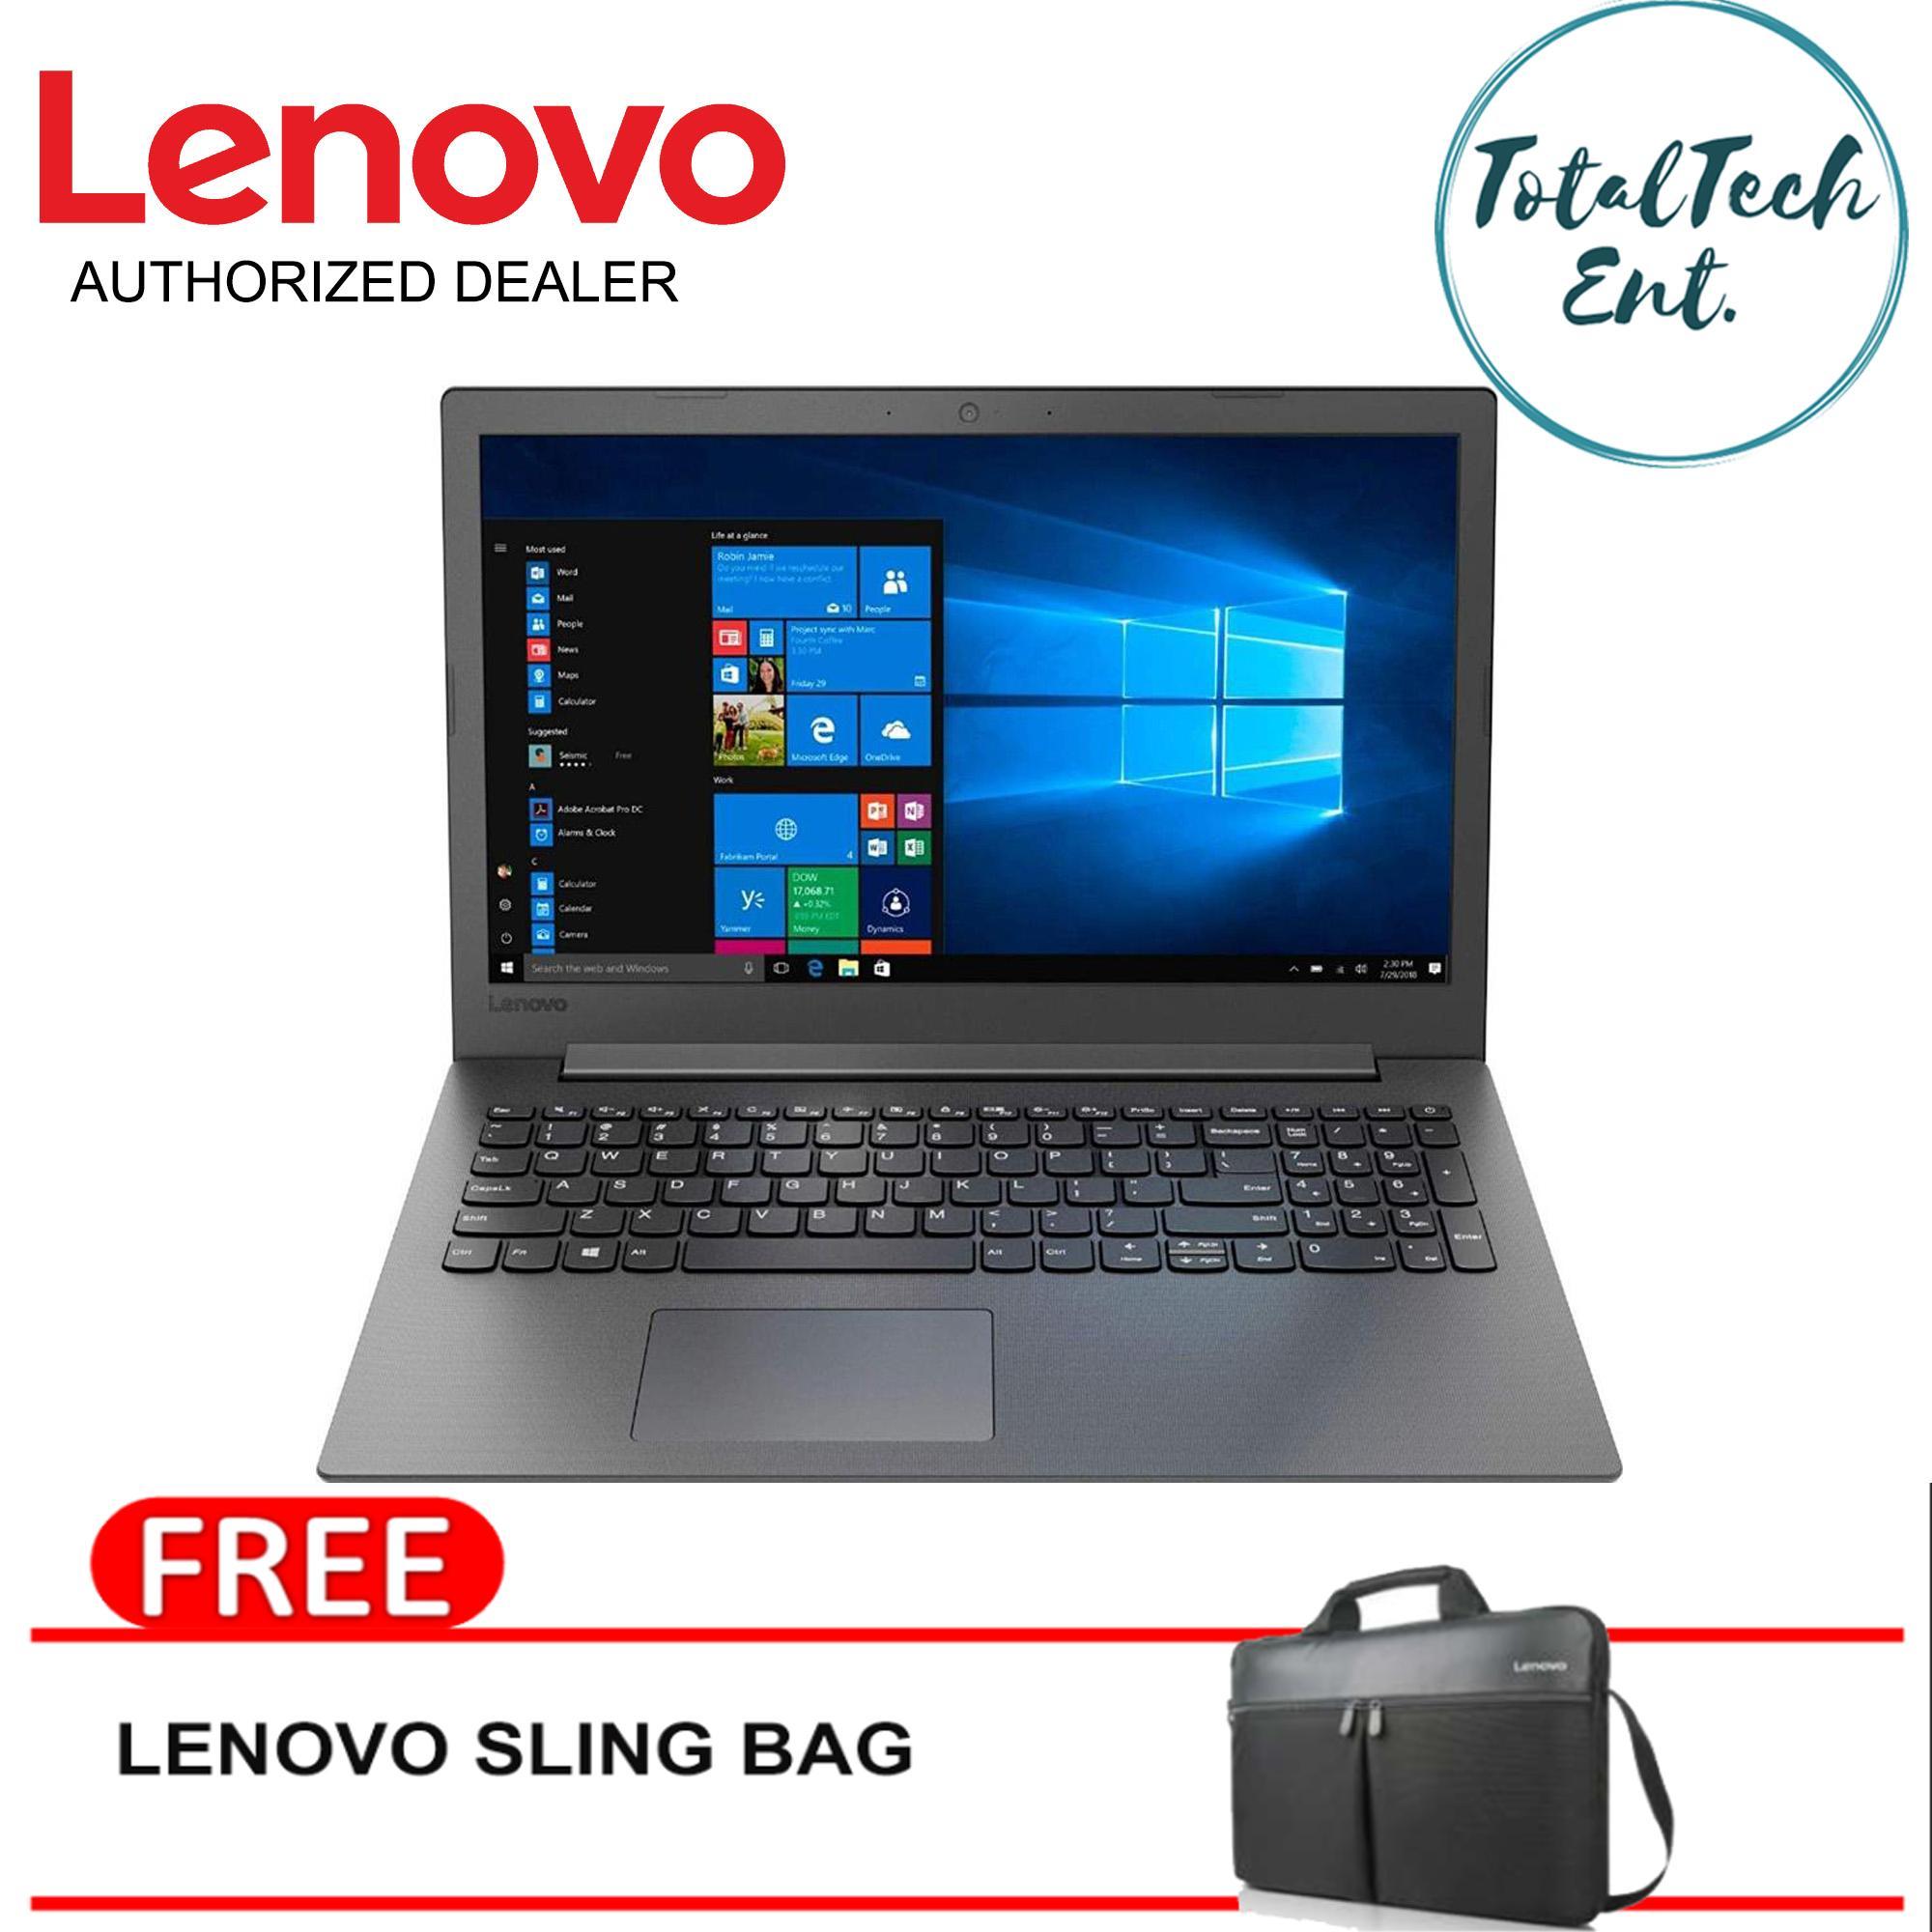 Lenovo Laptop Ideapad Mid-Gaming Laptop 130-15AST 81H5 A6-9225 / 4GB RAM /  500 GB HD with Radeon R4